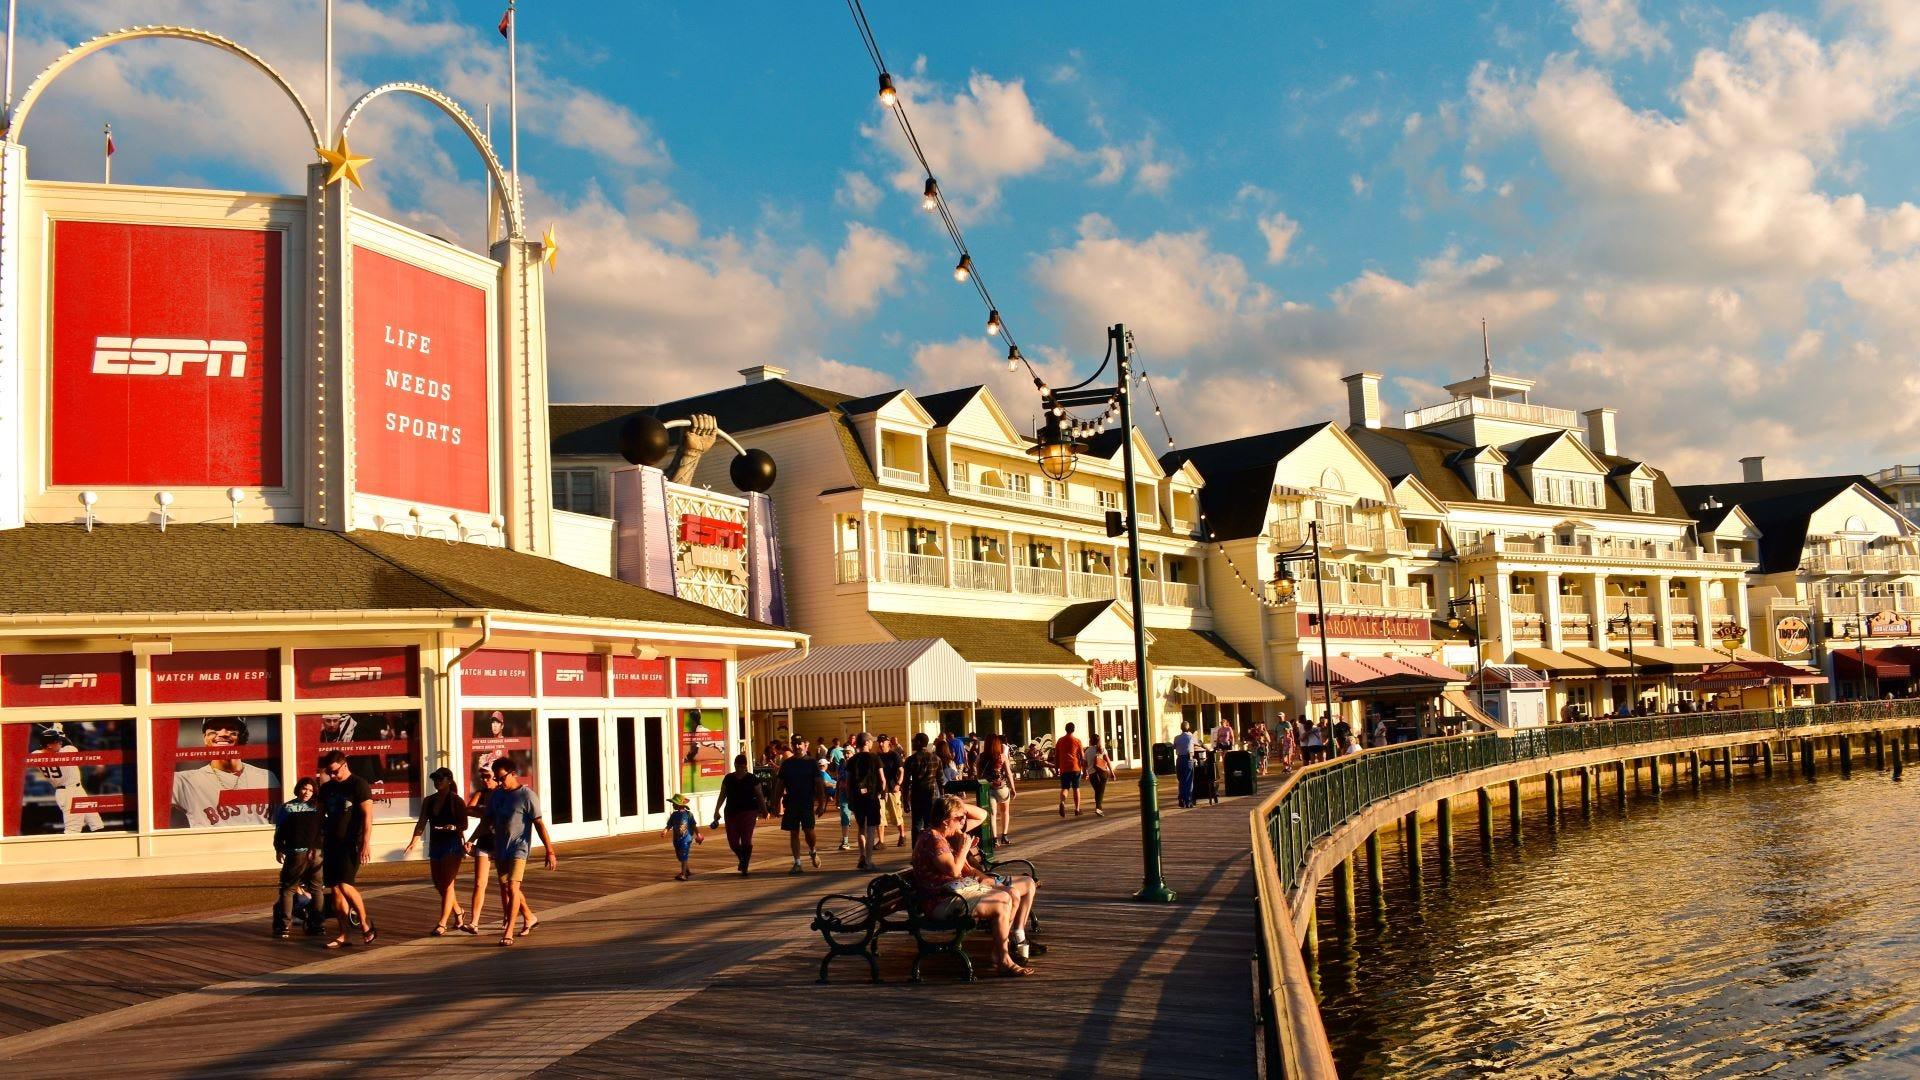 The Disney boardwalk on Lake Buena Vista in Orlando, Florida.